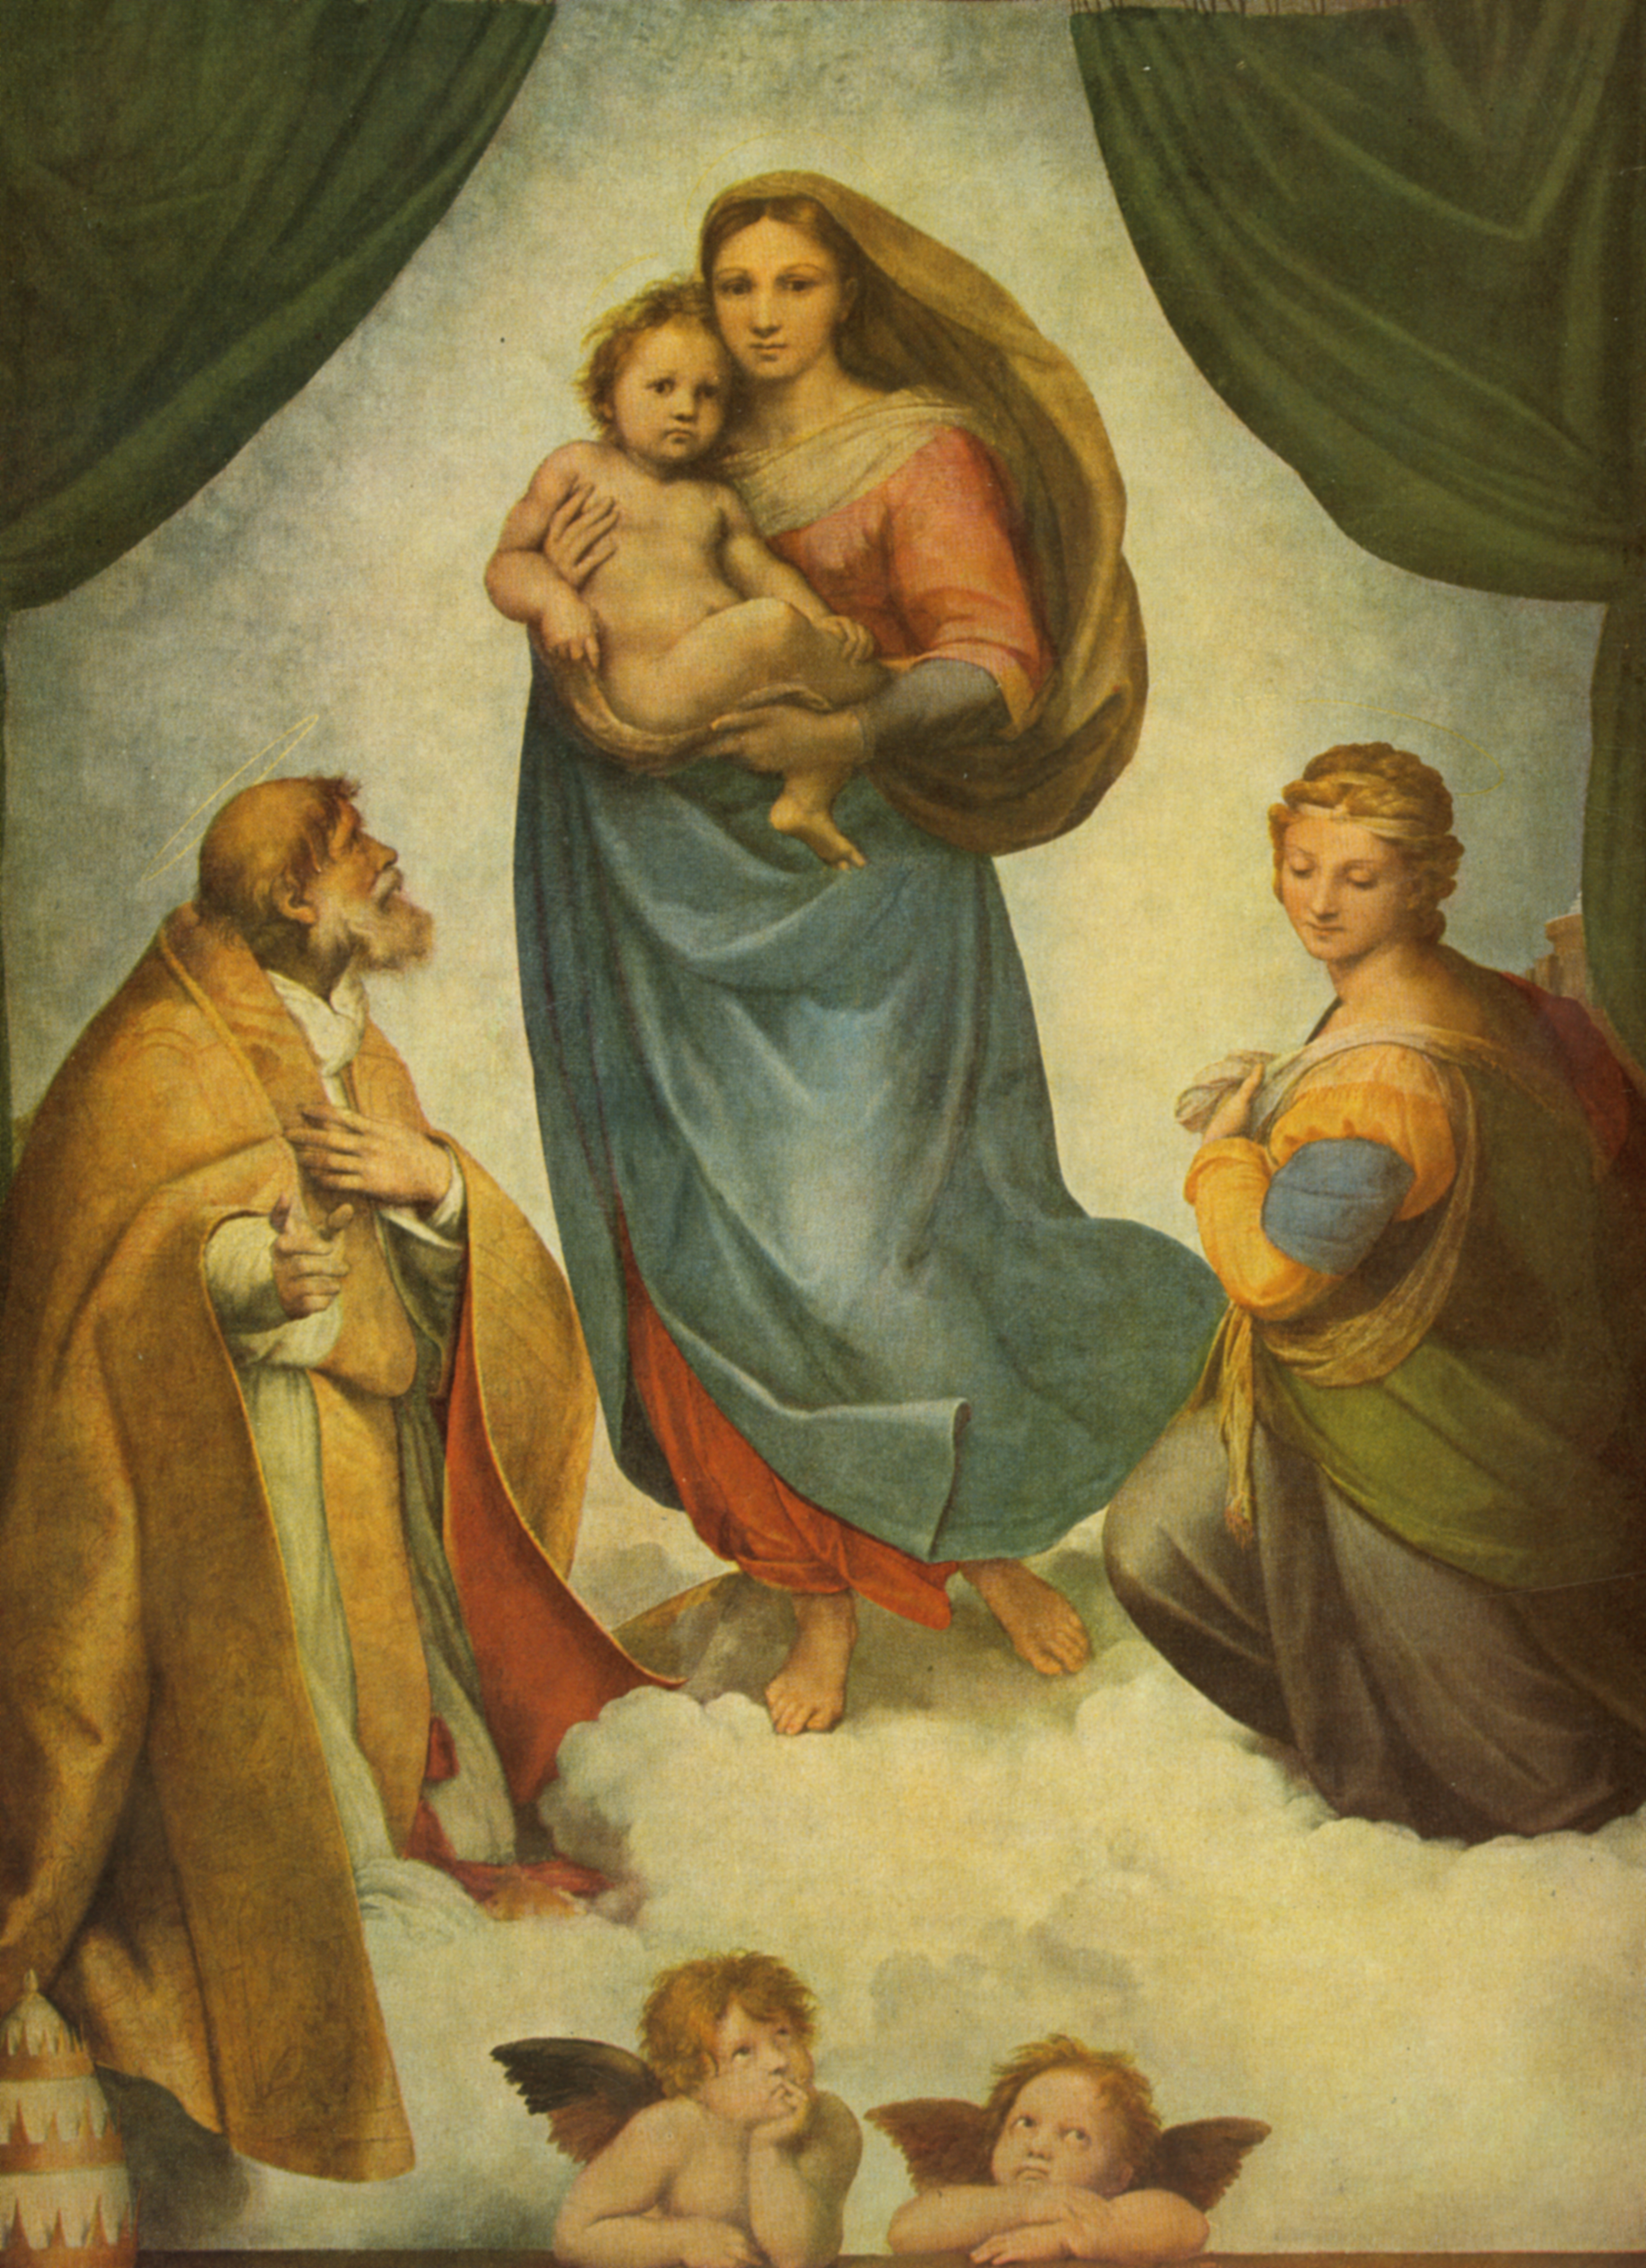 Sixtinische Madonna, Raffaello Sanzio